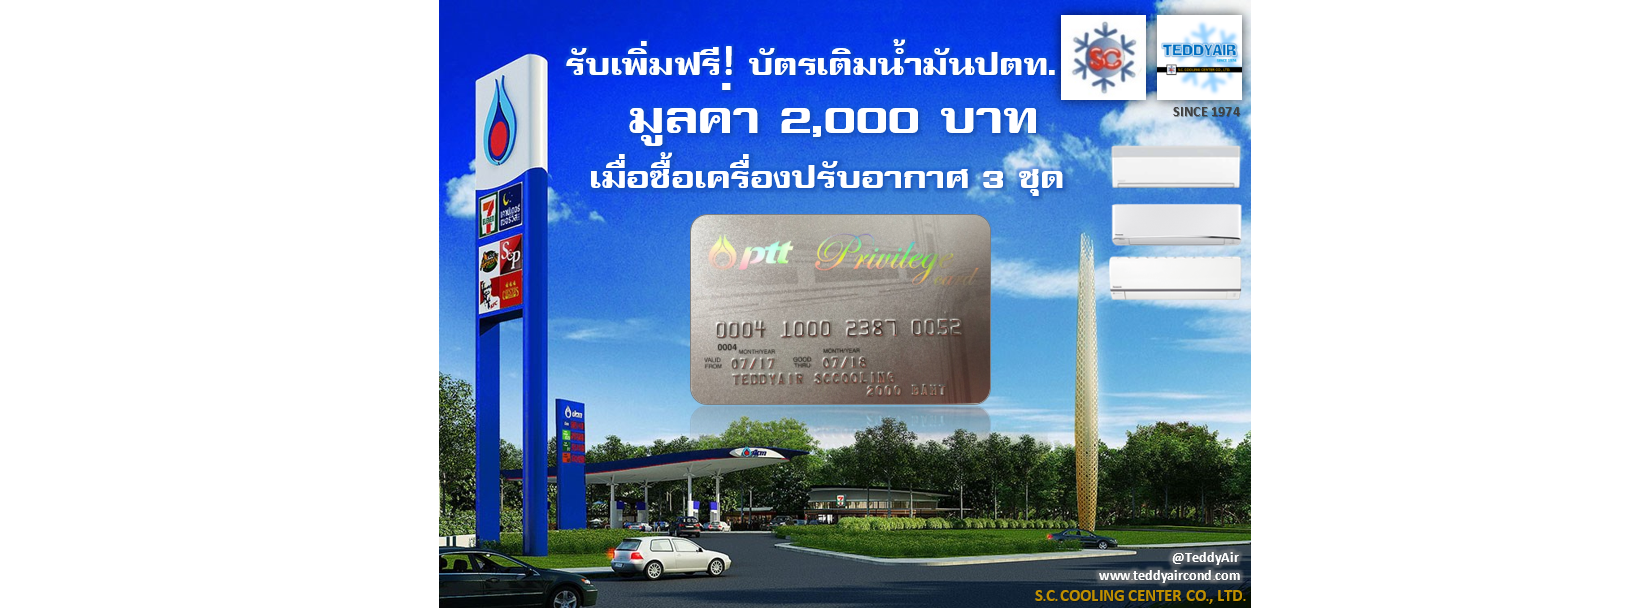 Free PTT Priviledge card 2000฿ if buy 3 units TeddyAir SCcooling